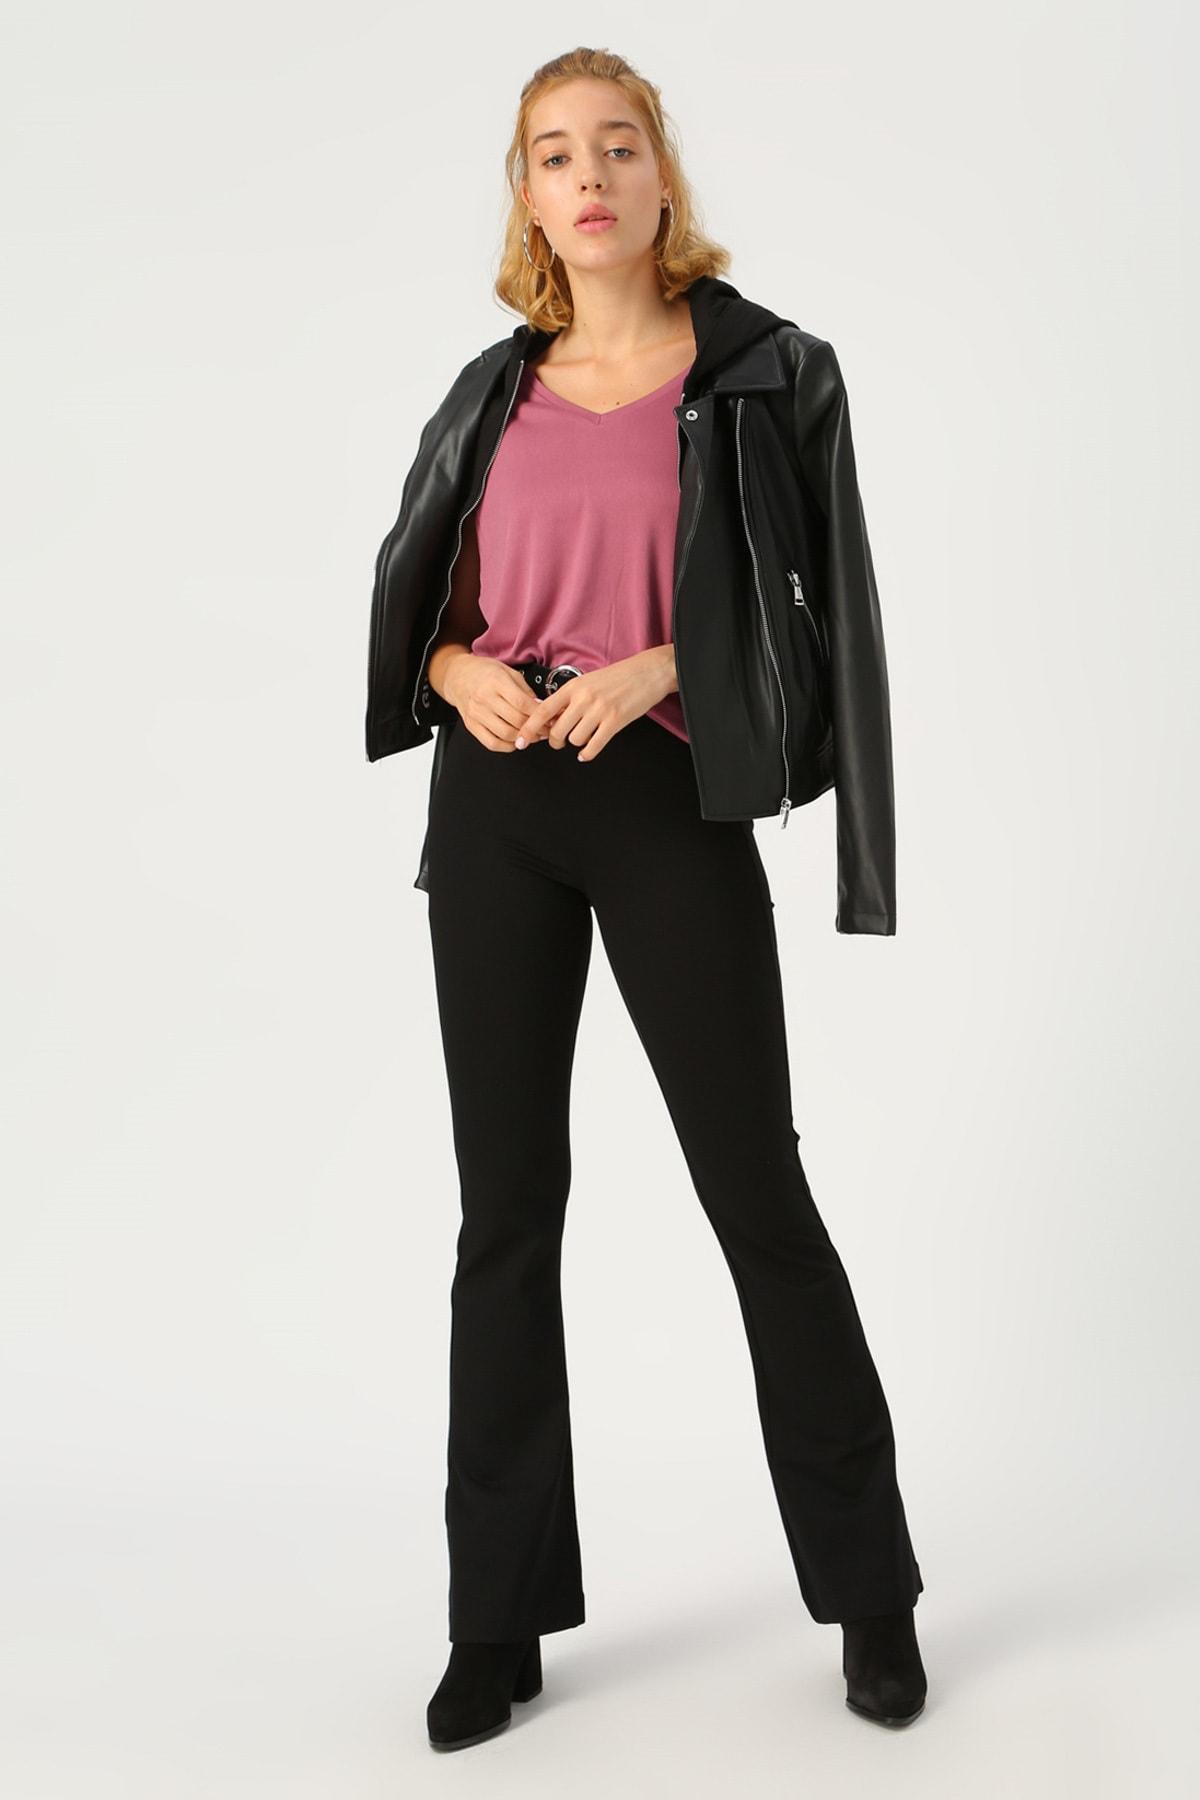 Vero Moda Kadın Siyah Siyah İspanyol Paça Örme Pantolon 10209858 VMKAMMA 1